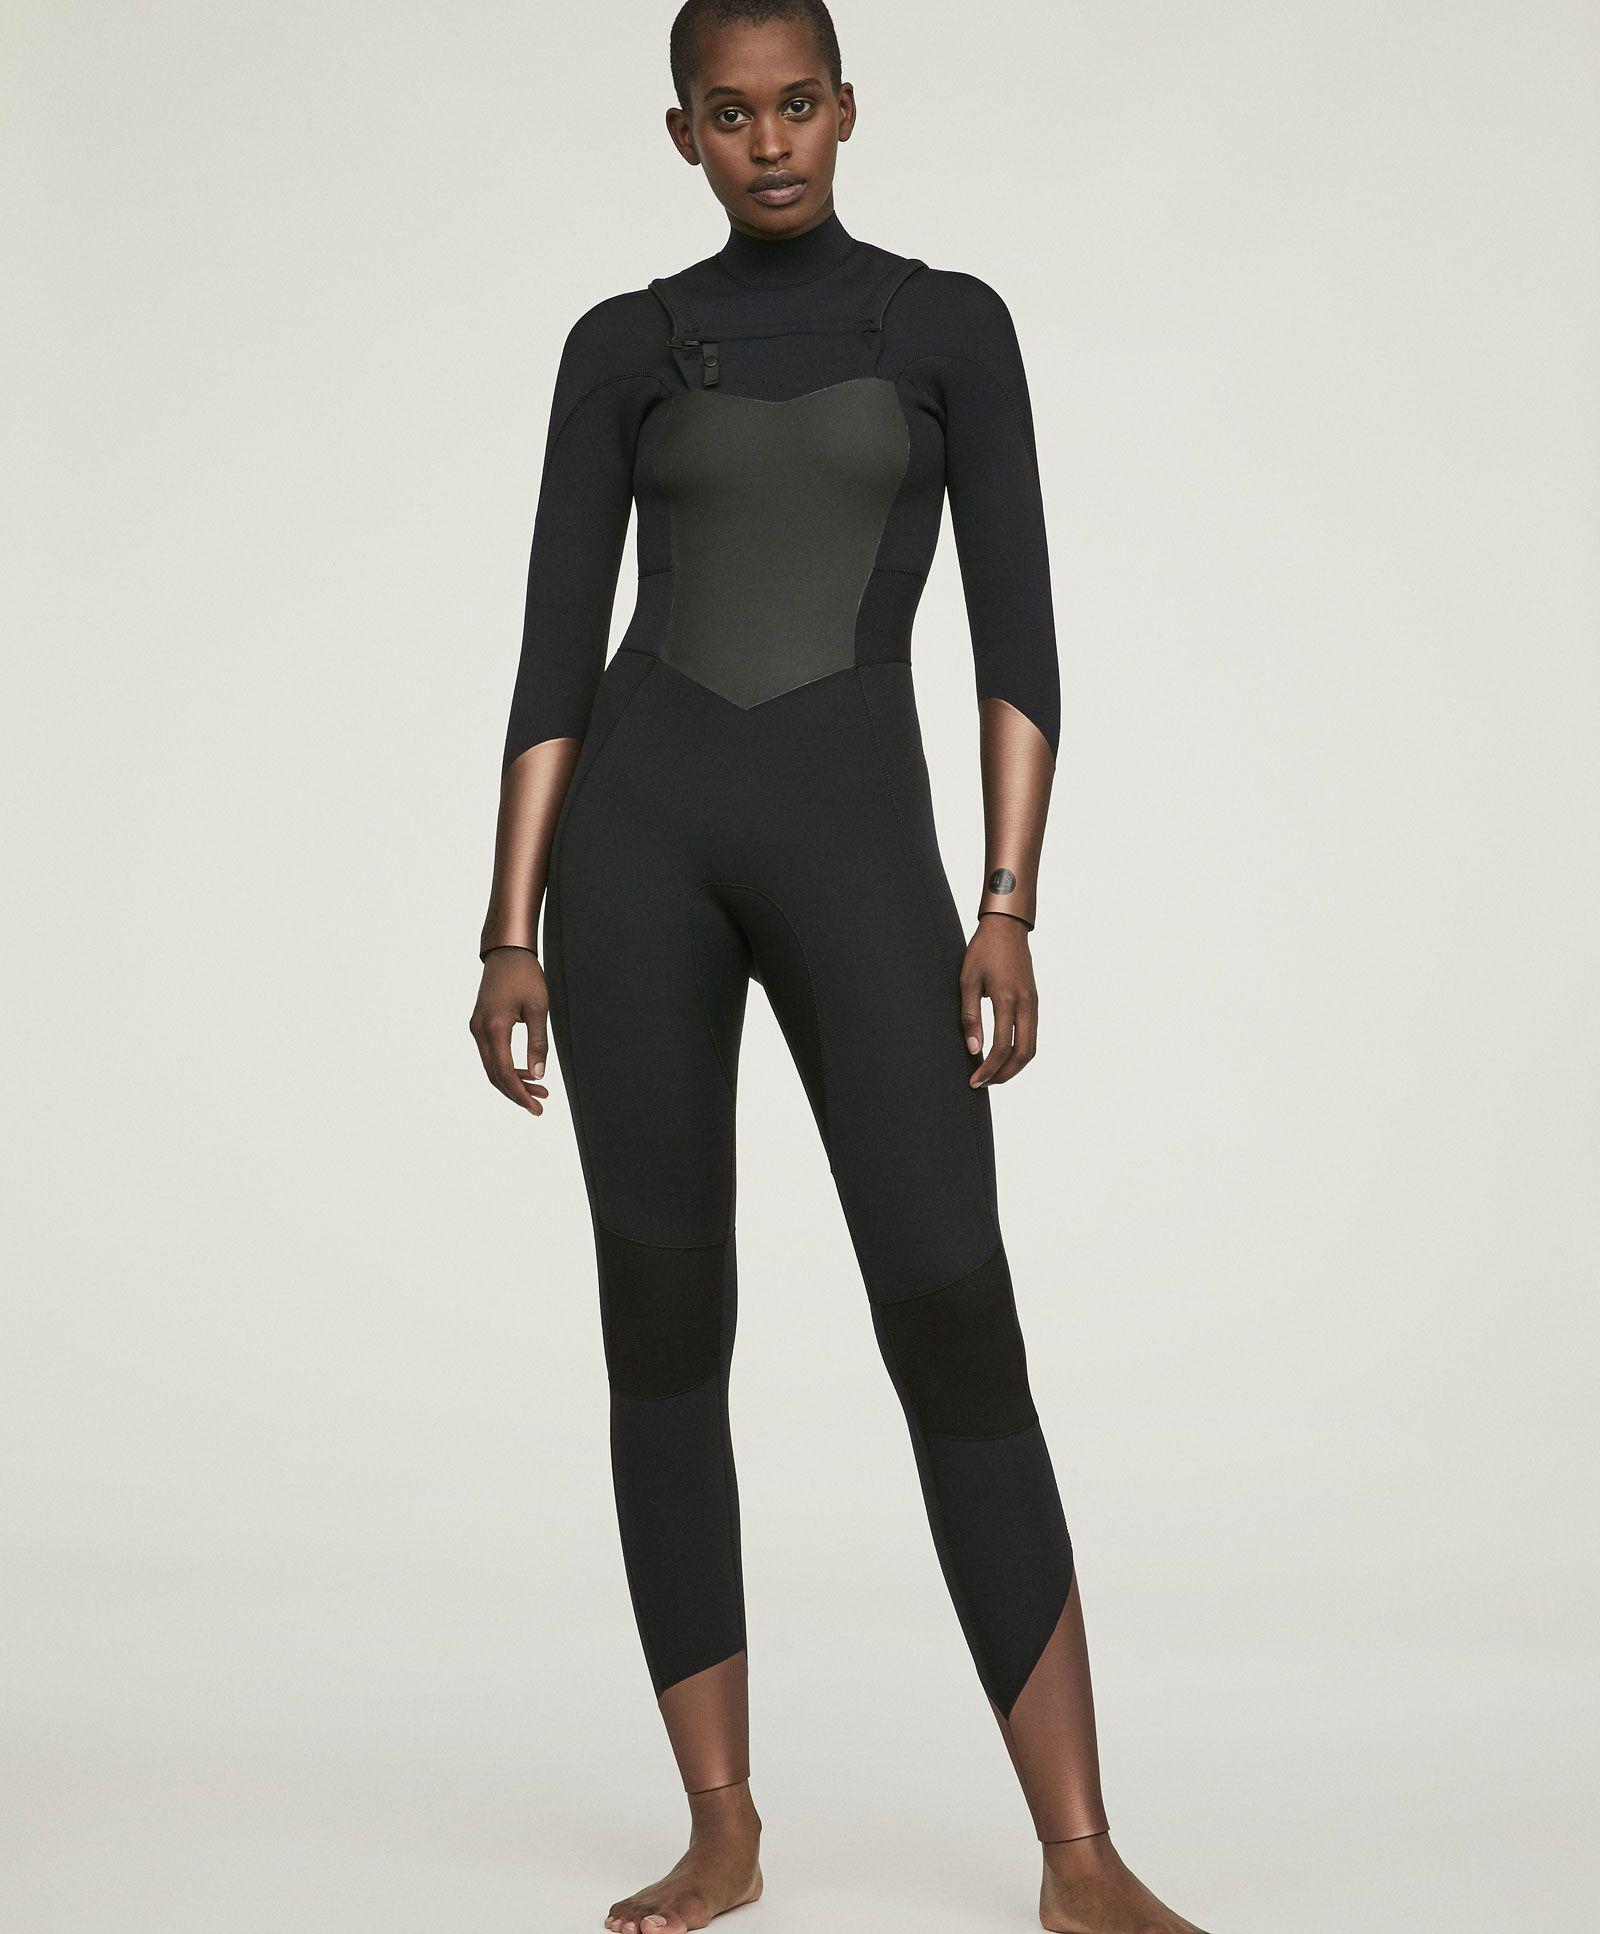 f8c10a2cf4 OYSHO neoprene wetsuit - Watersports - ACTIVEWEAR